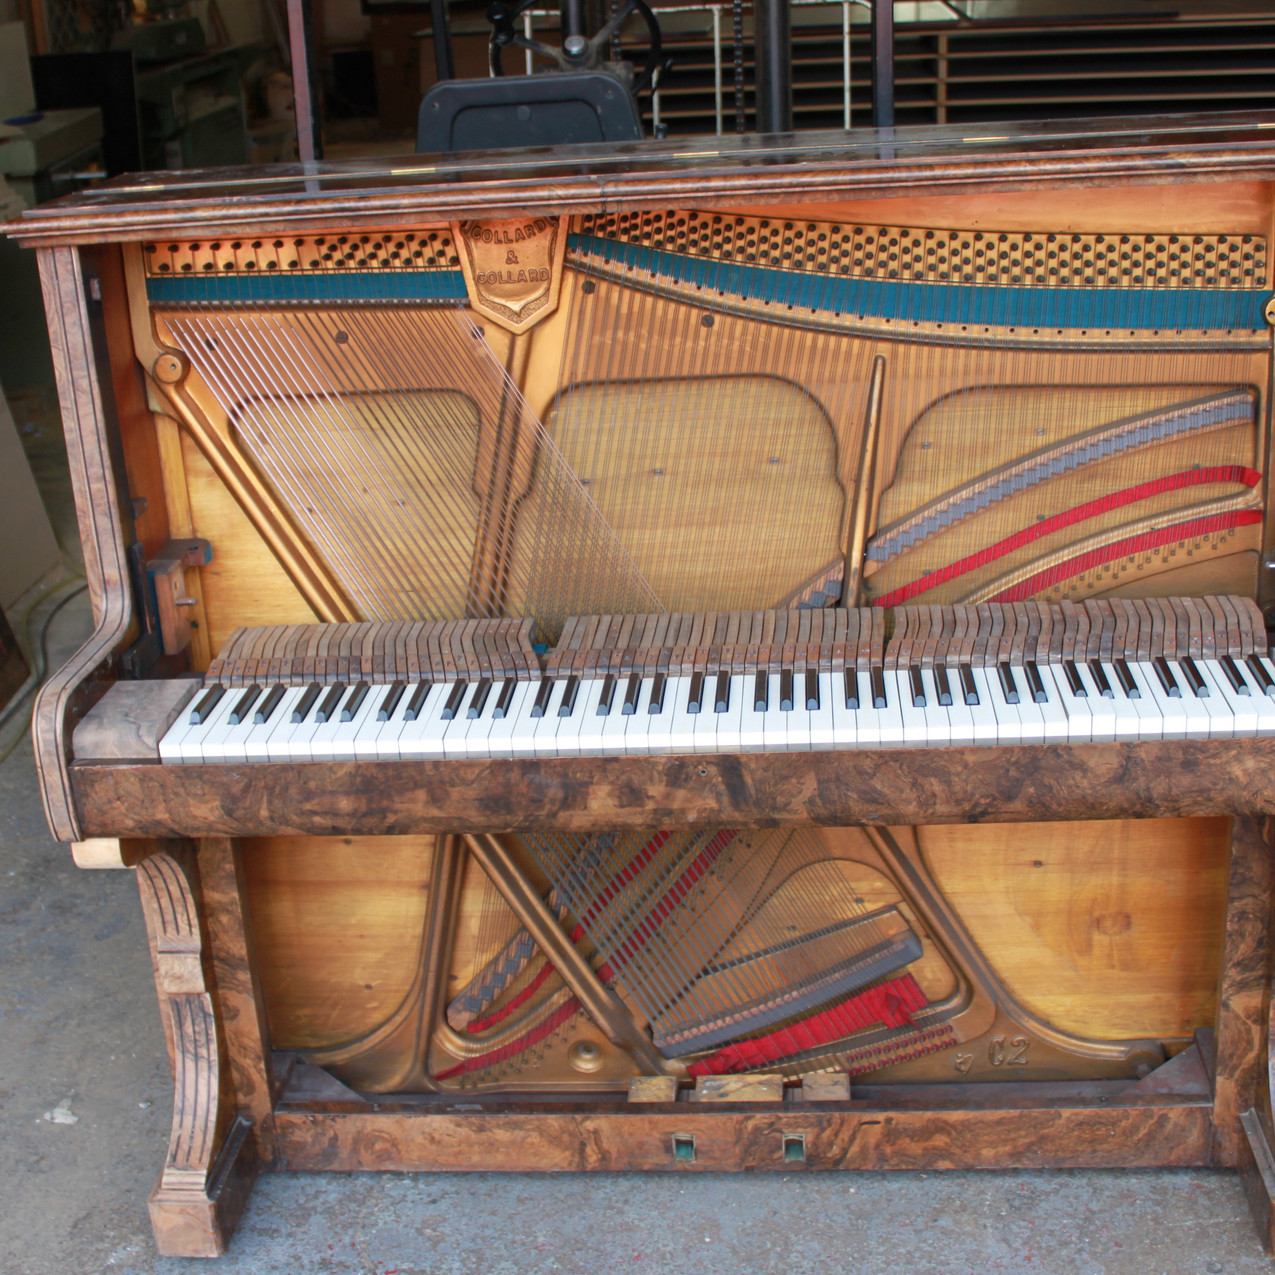 Piano bar transformation